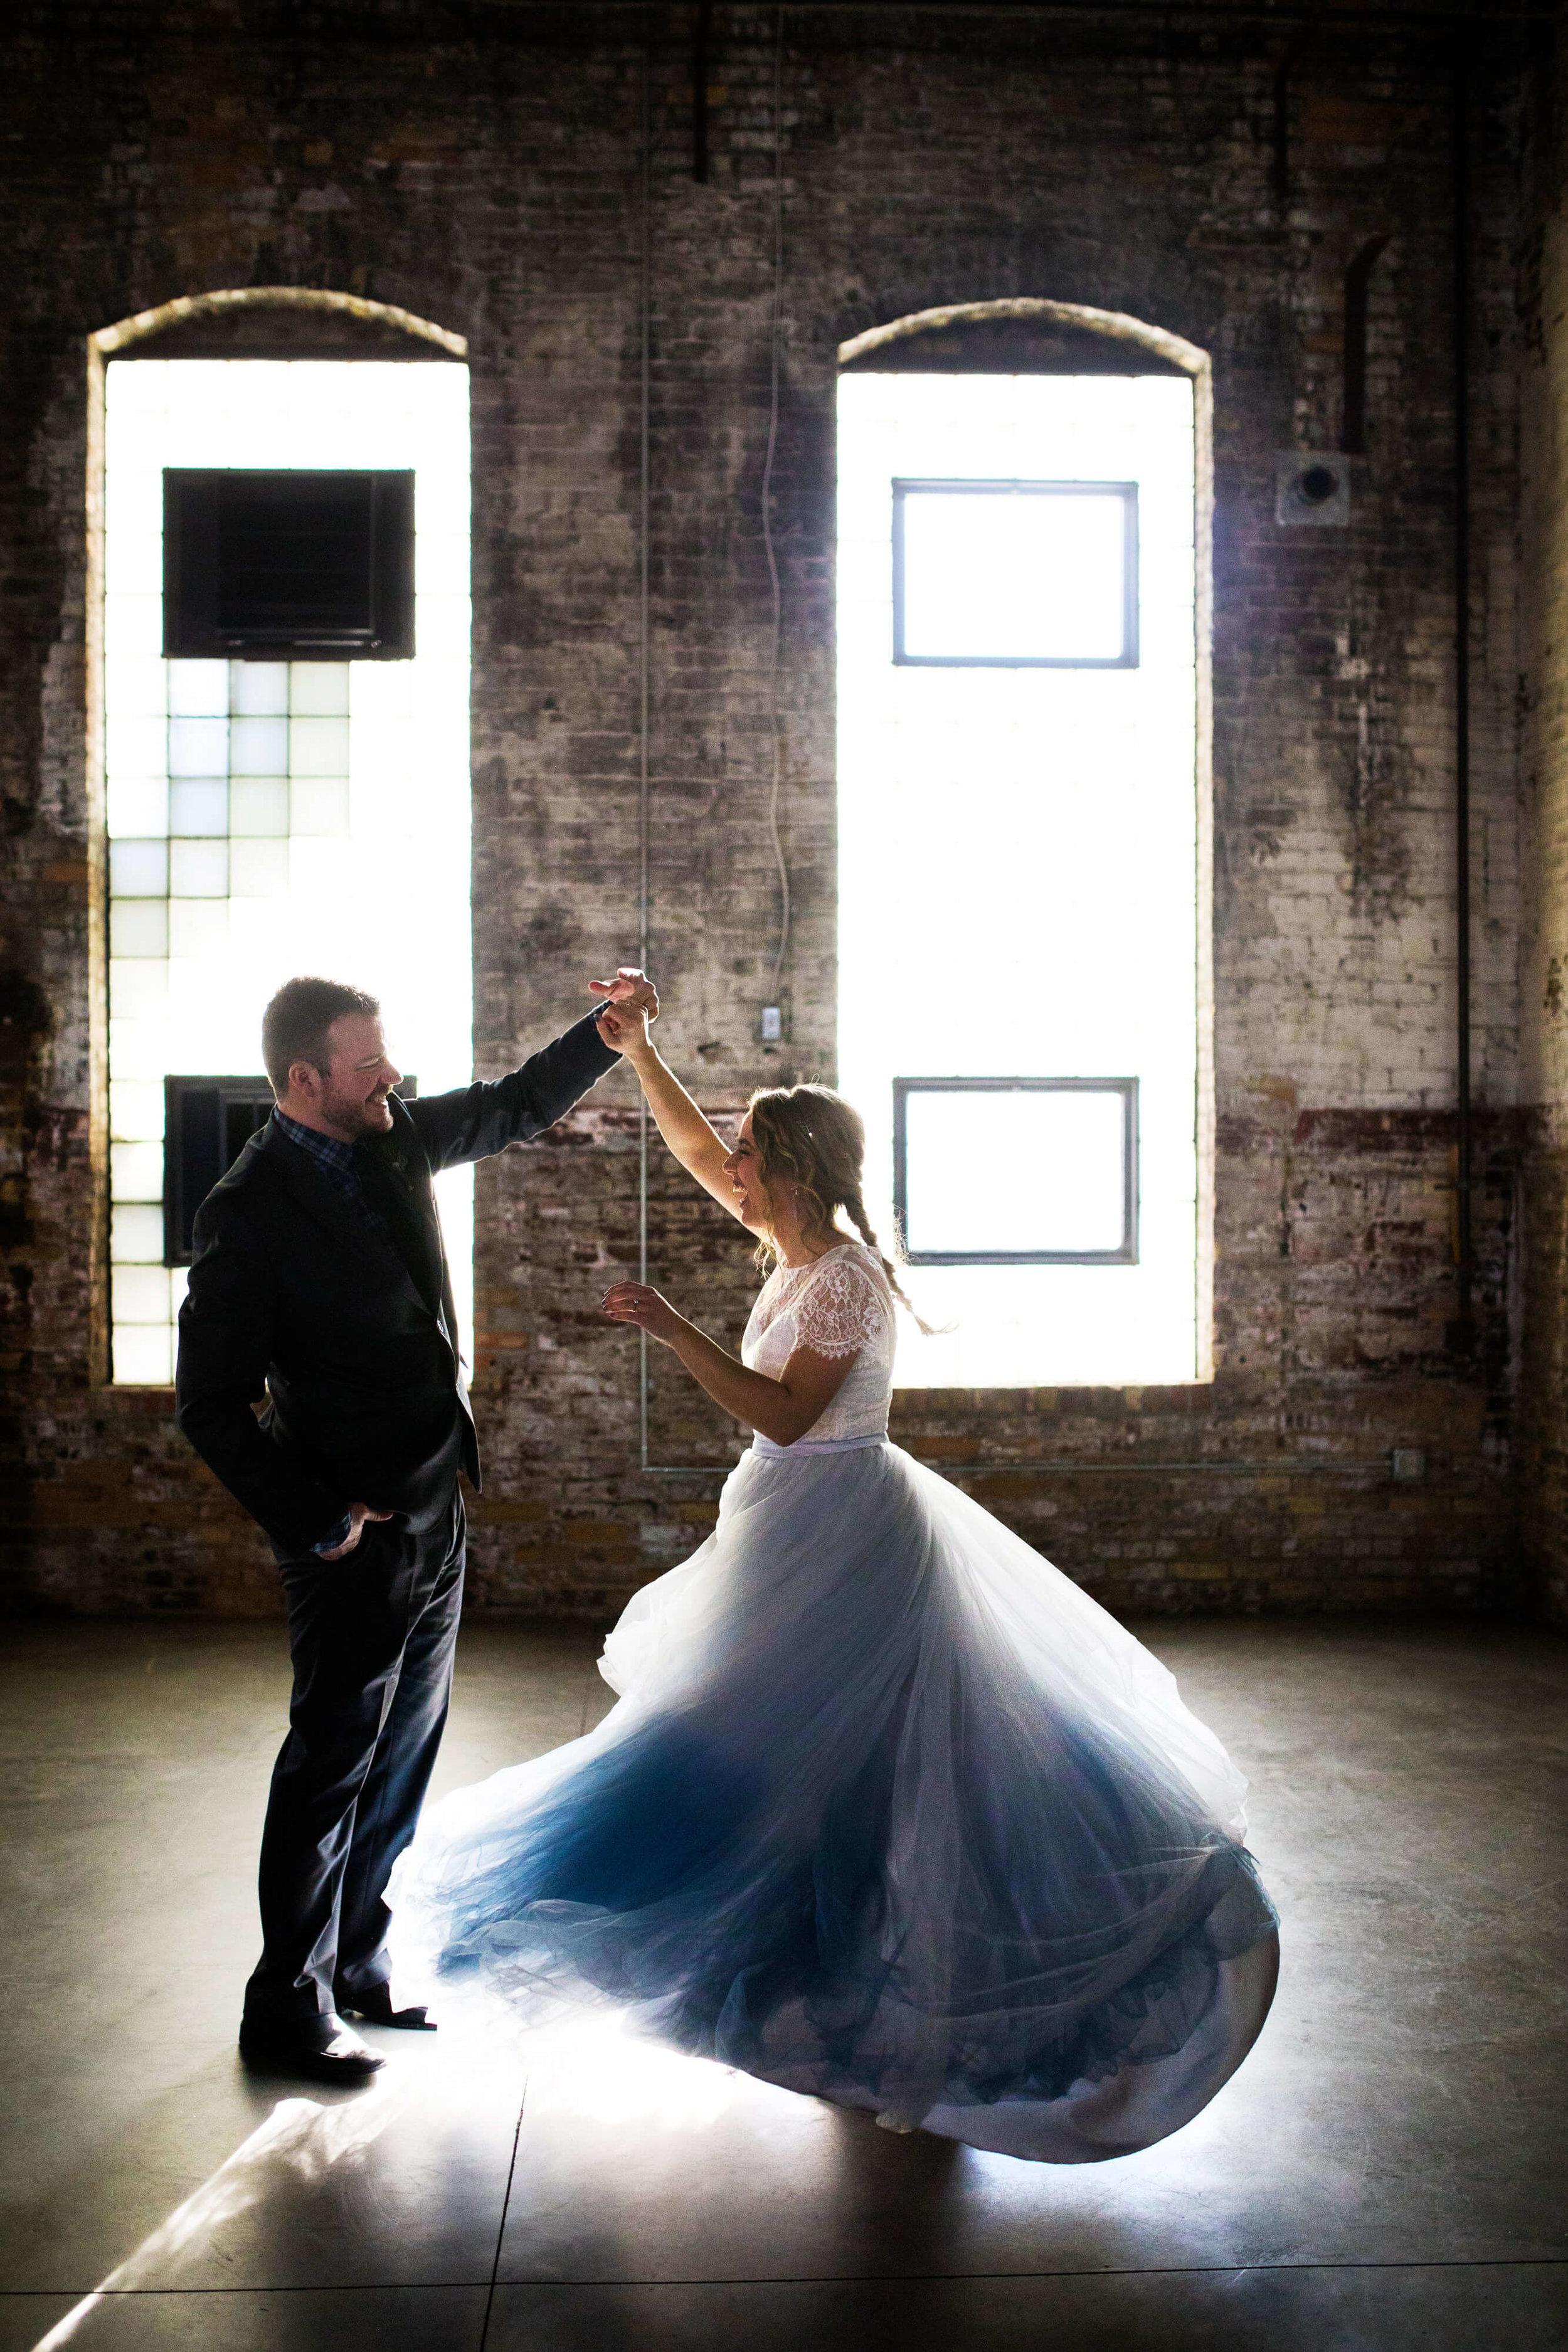 twirl photo | bride with single braid | blue tulle gown | Minnesota wedding photographer Studio KH wedding dress details | wedding blog | Sixpence Events 70 Ways to Photograph Your Wedding Dress.jpg